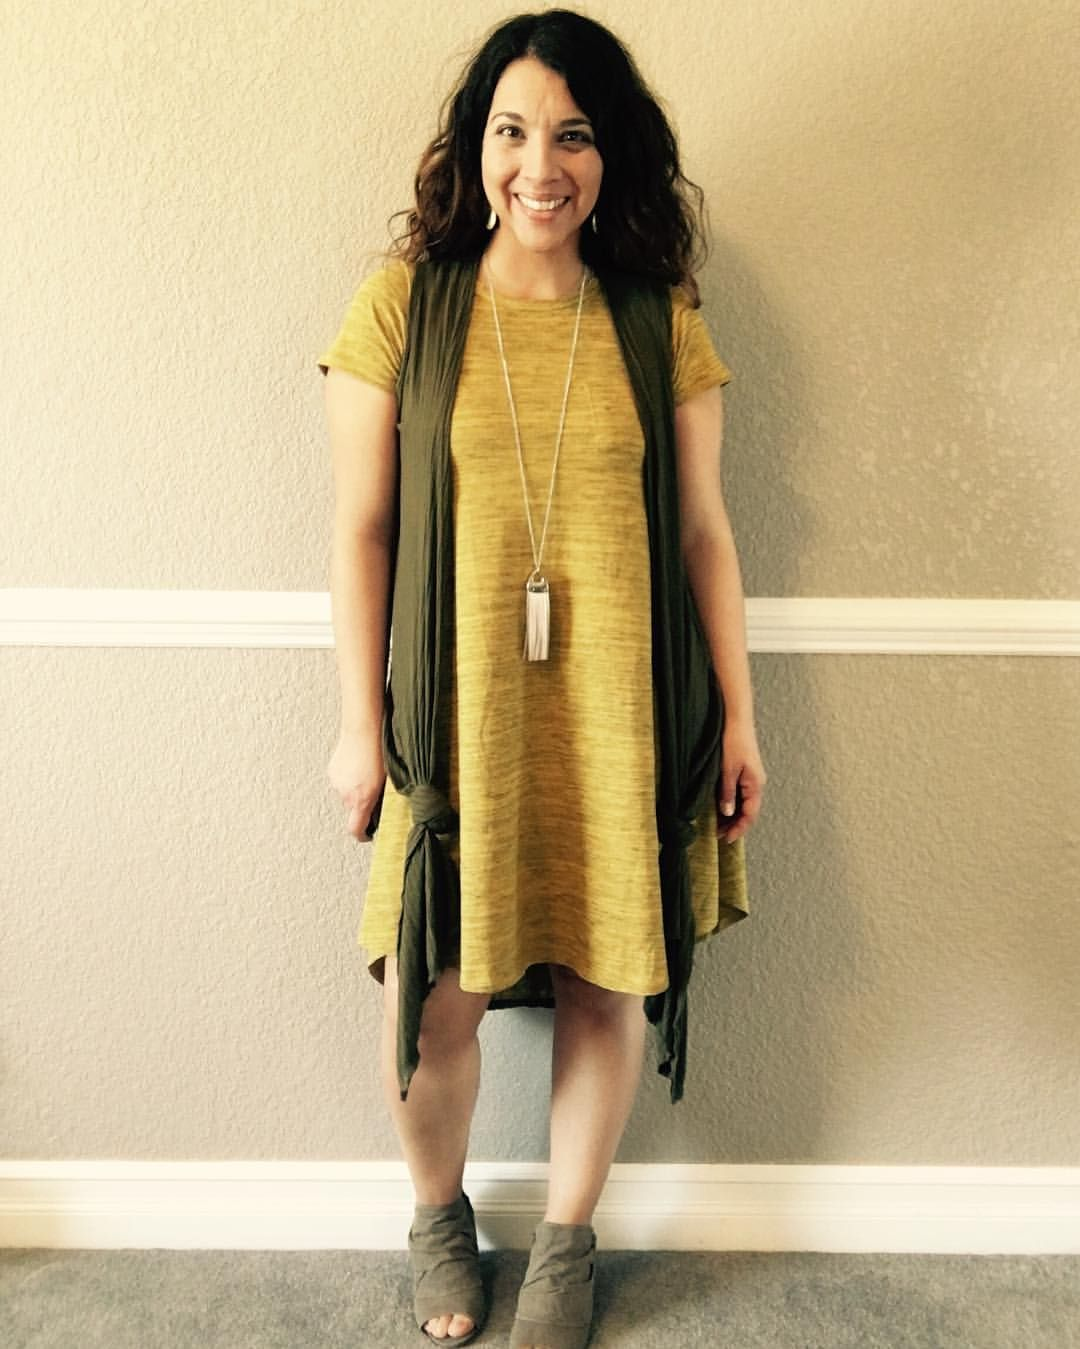 Green dress night out  LuLaRoe yellow mustard Carly dress layered with a green knotted Joy